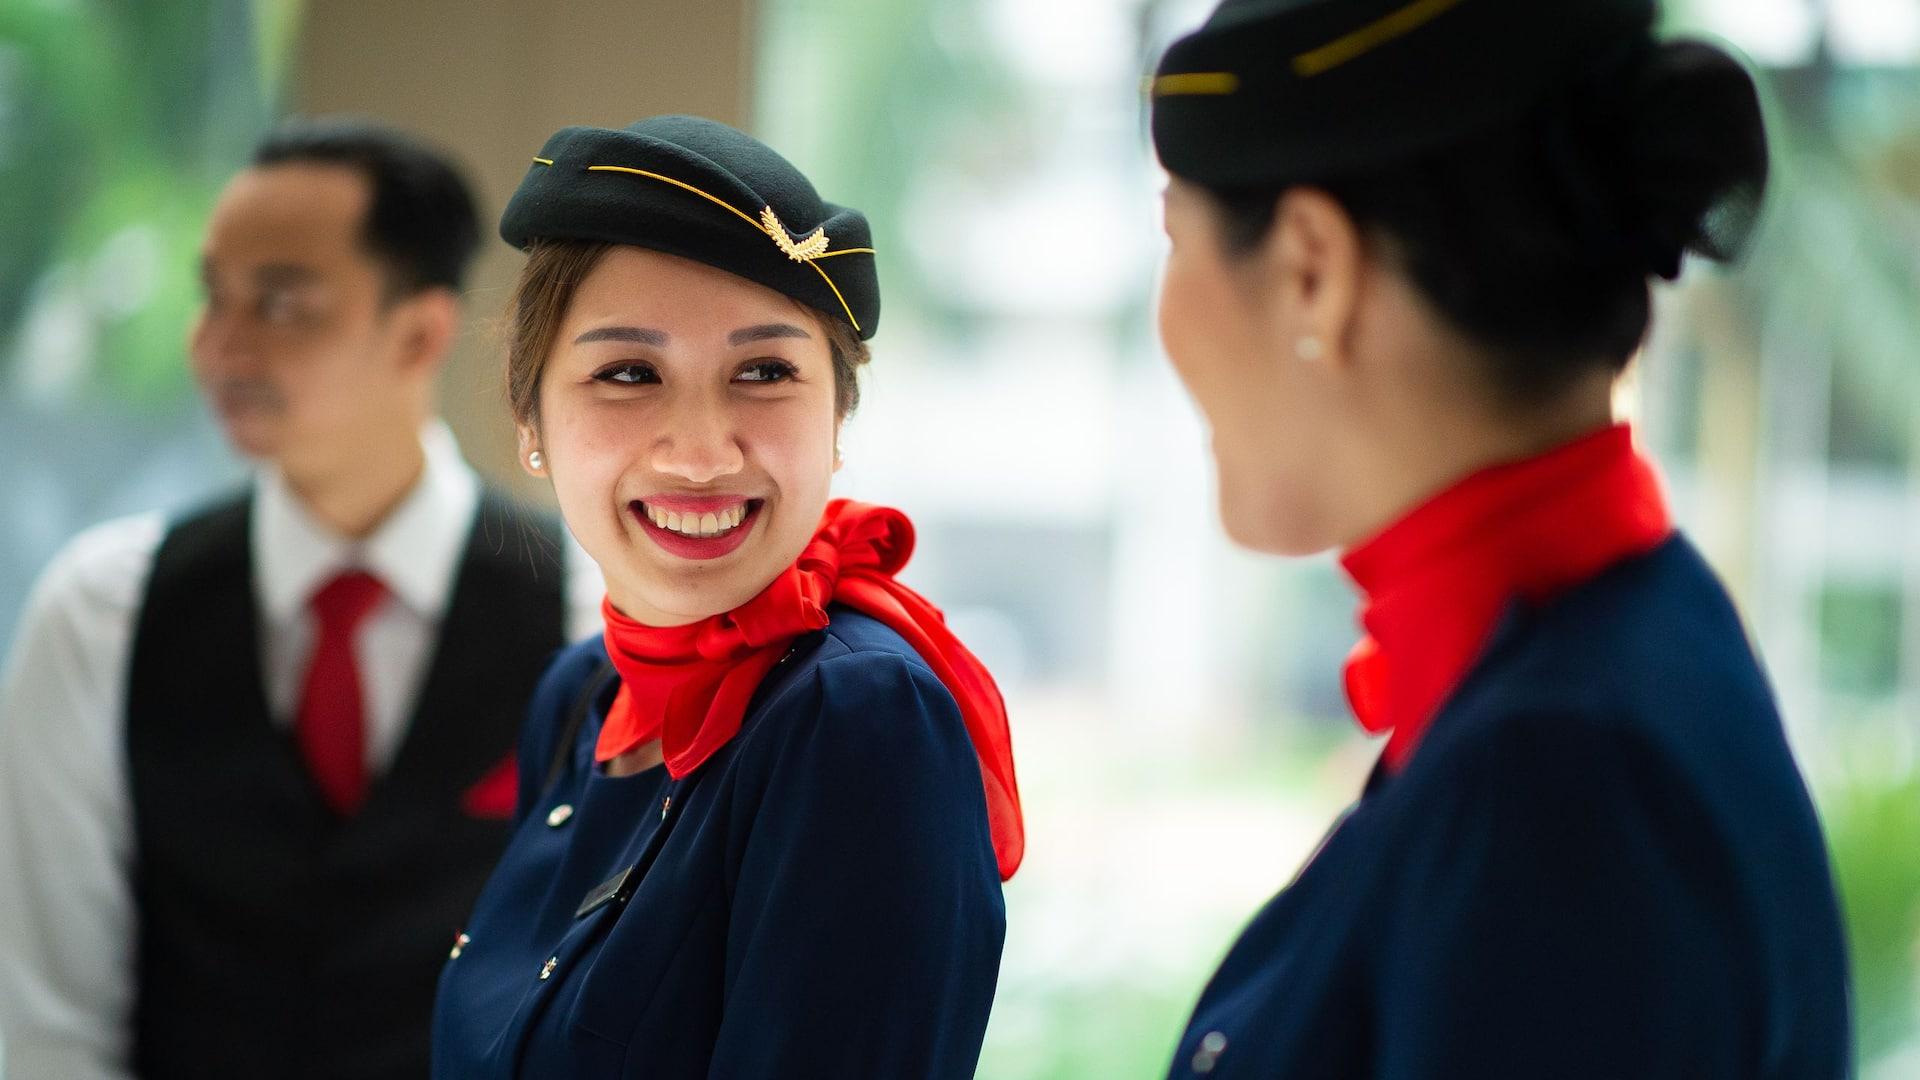 GRAND HYATT KUALA LUMPUR - FLIGHT ATTENDANTS